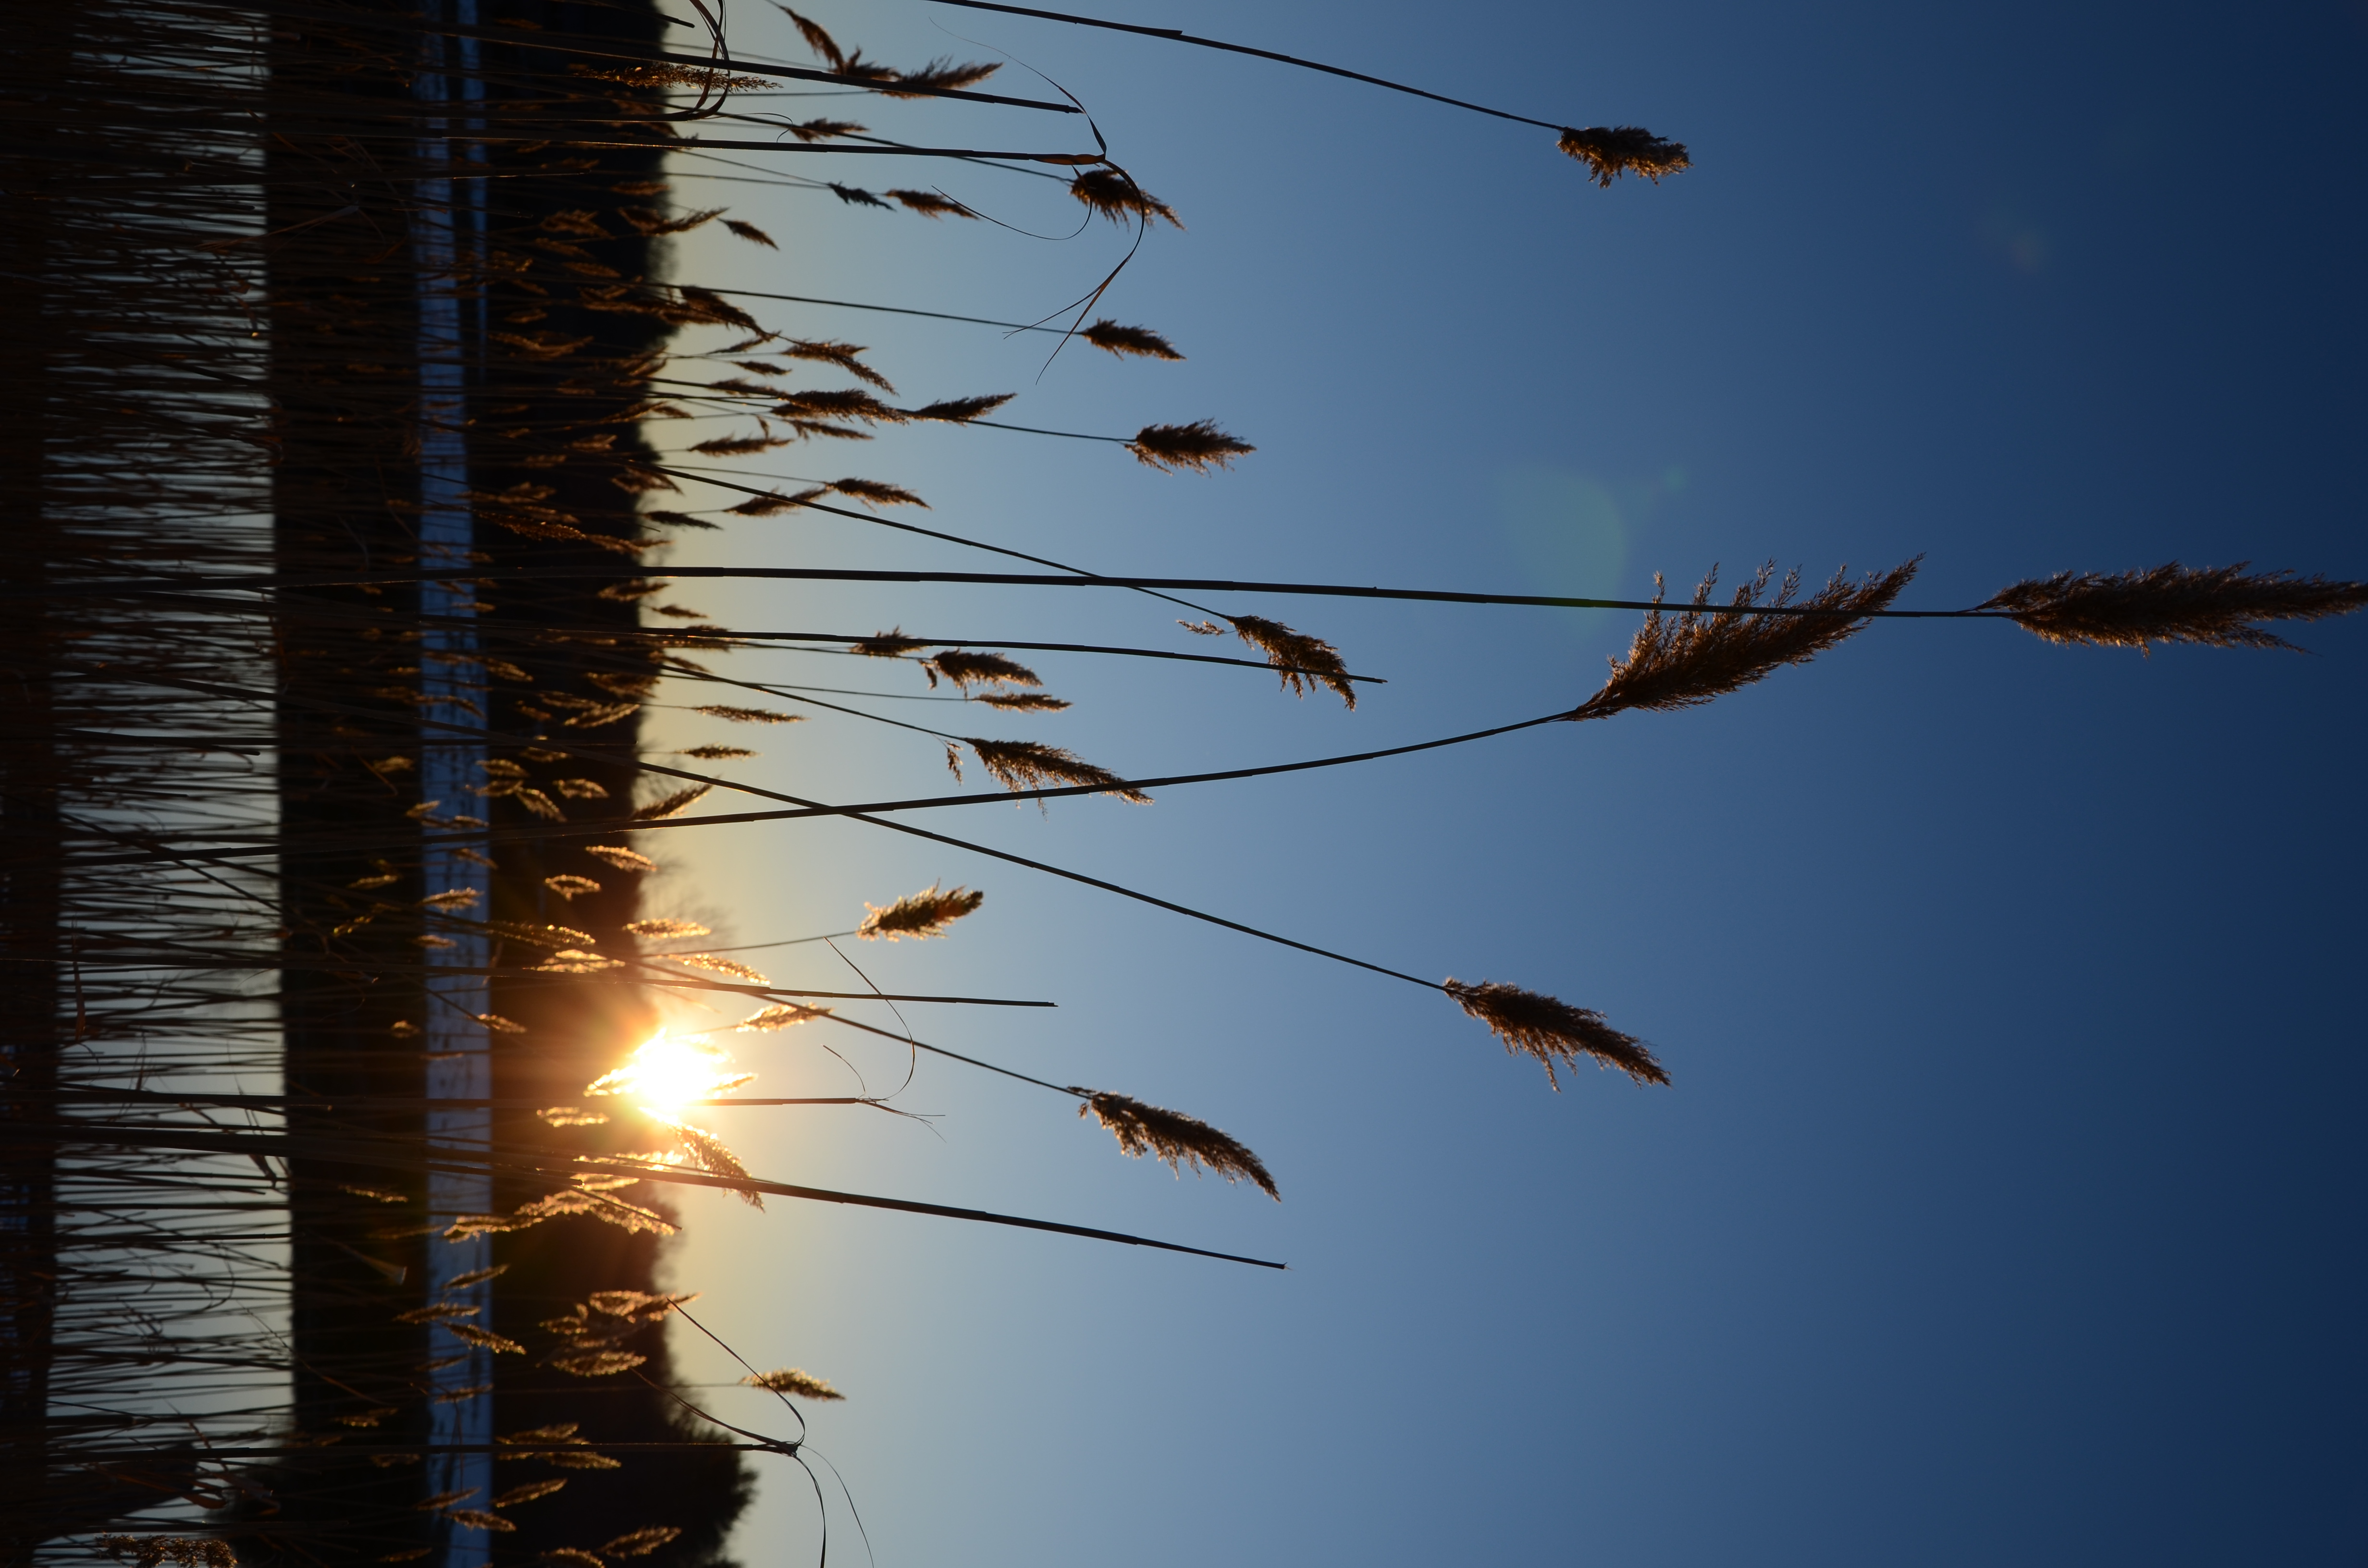 Wilder St, Lowell, MA, USA Sunrise Sunset Times